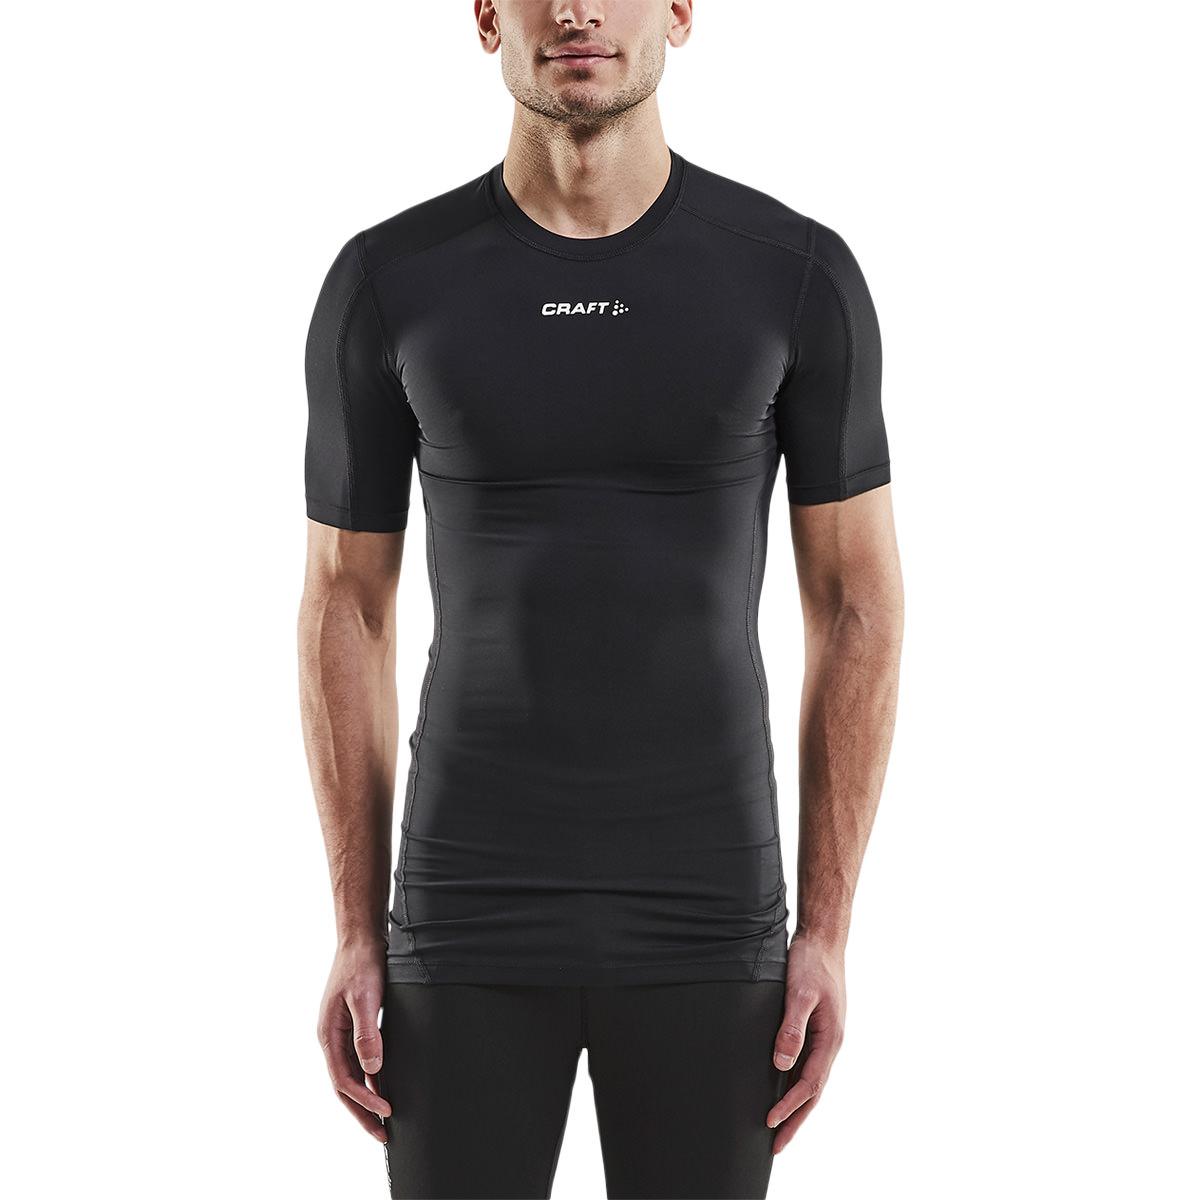 Craft Pro Control Kompression Trænings T-shirt Unisex